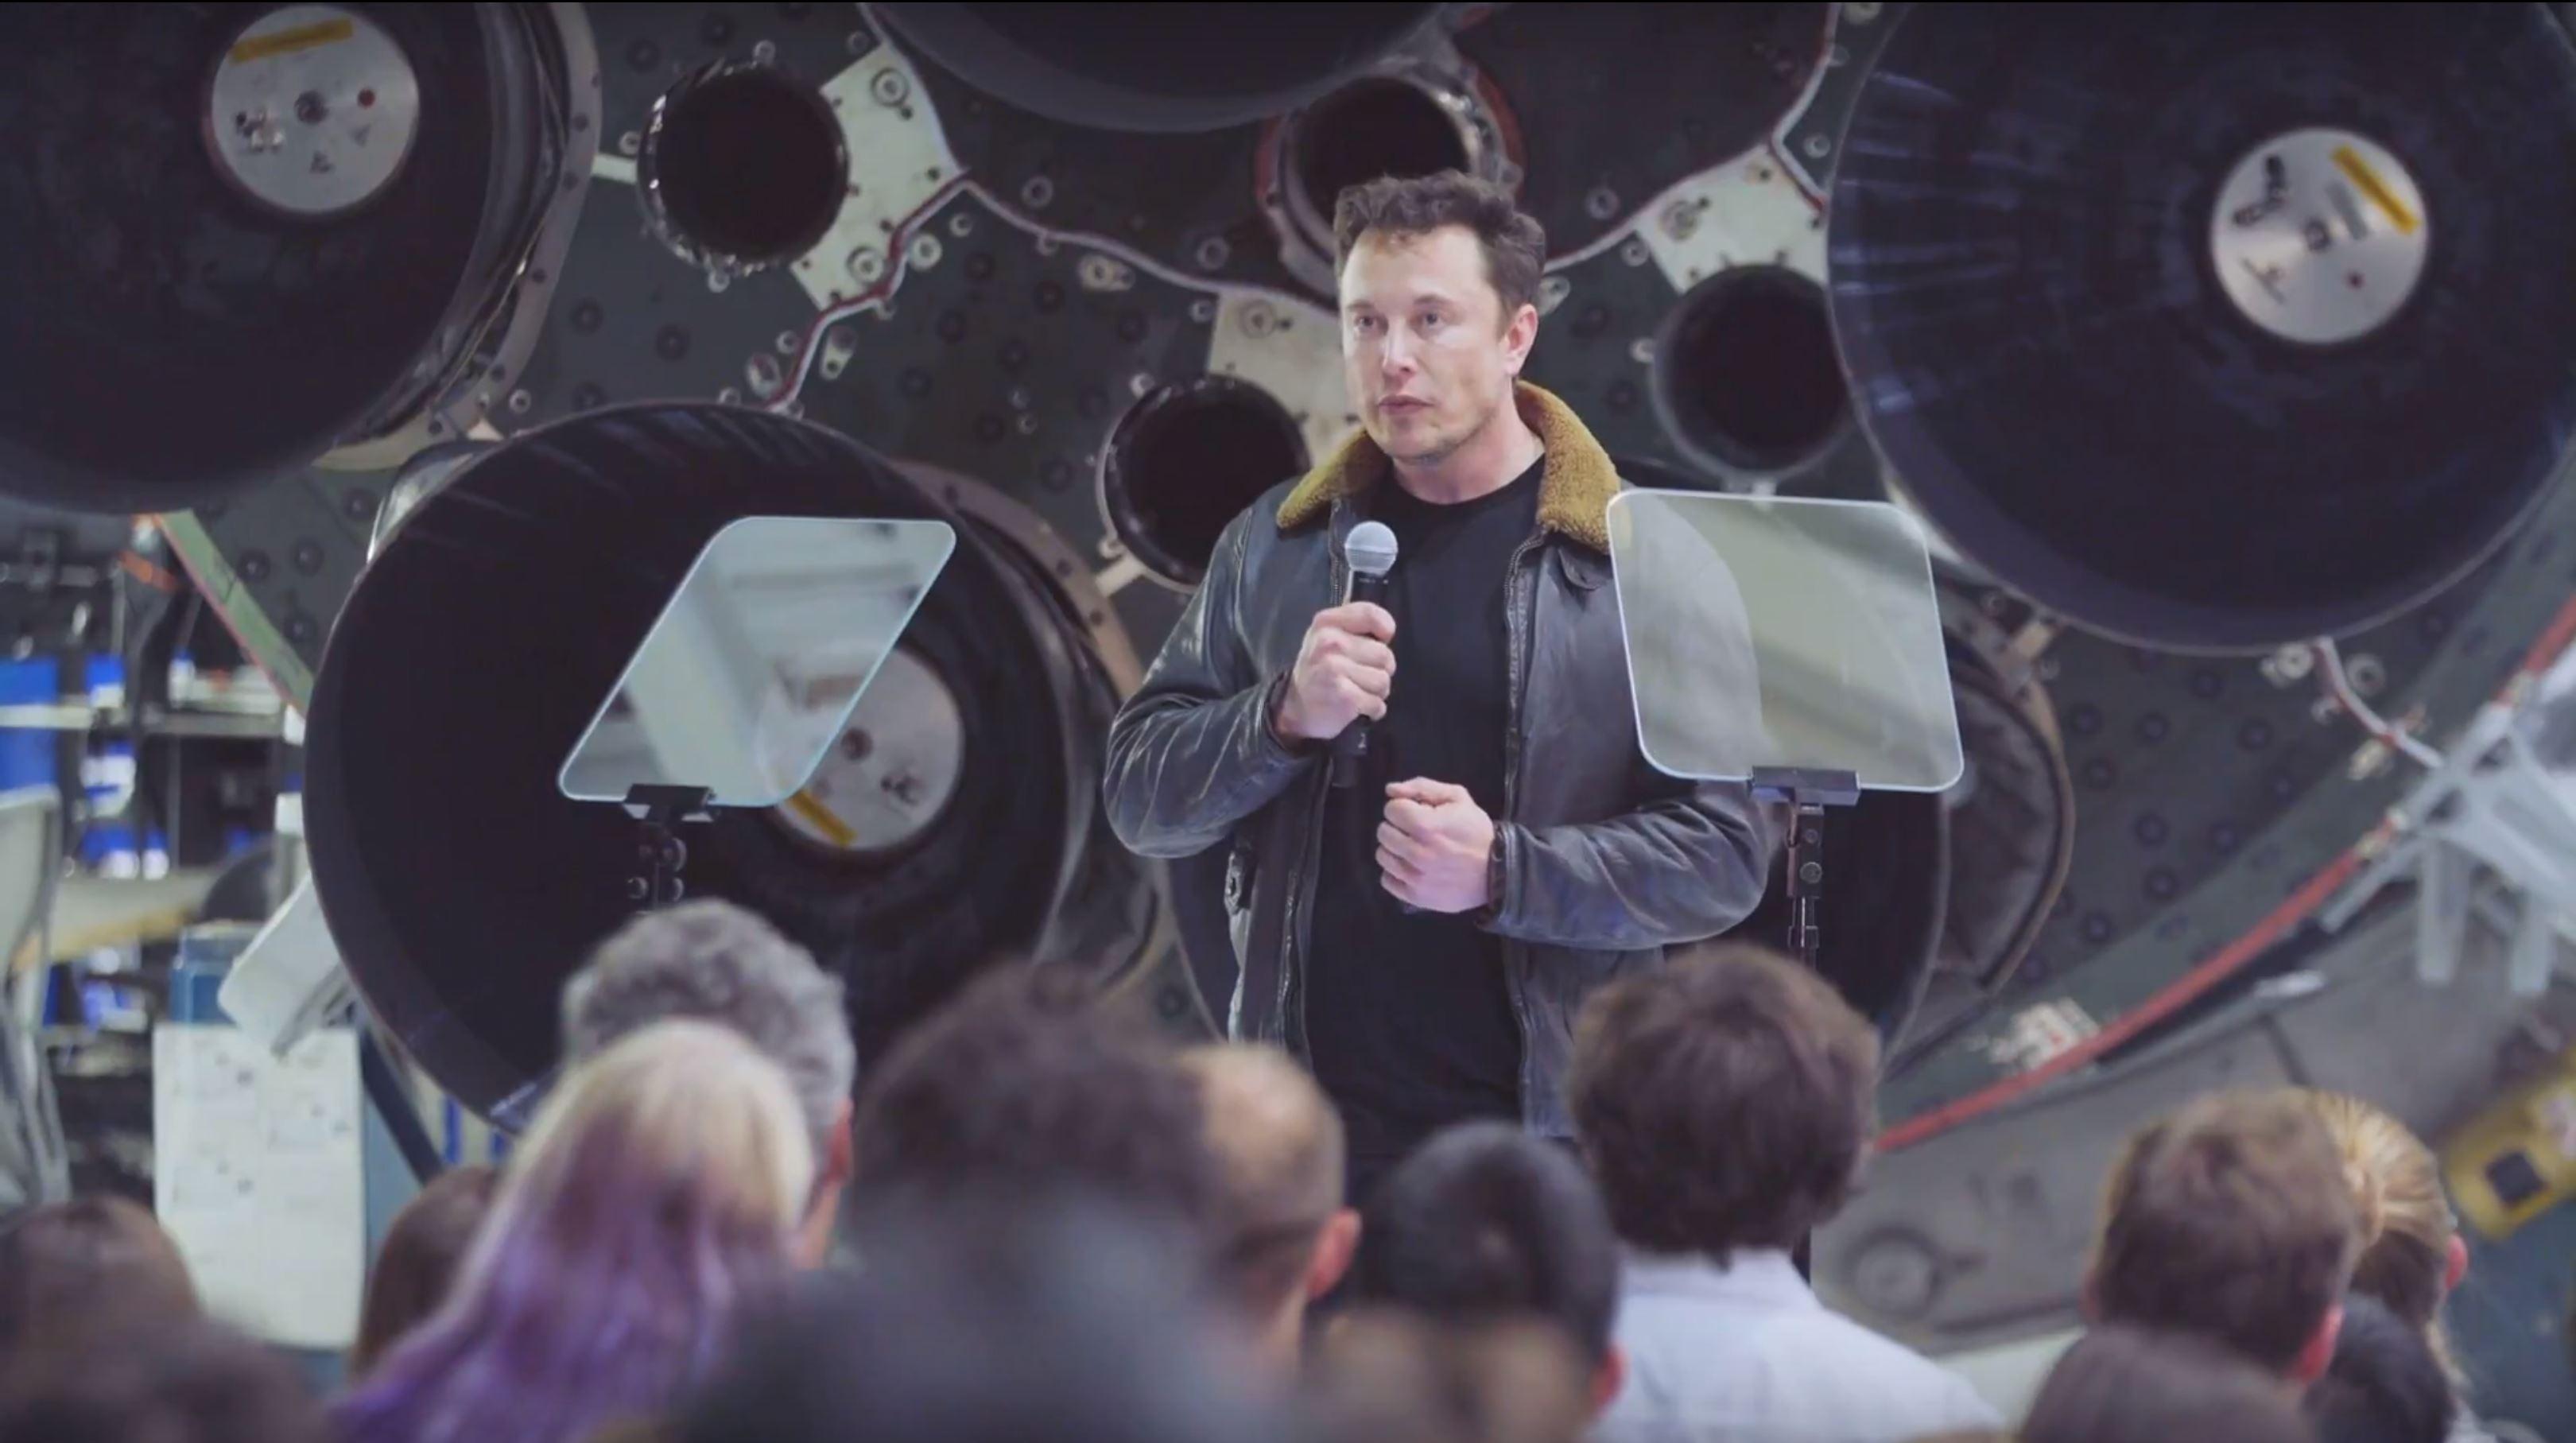 BFR 2018 event Elon Musk (SpaceX) 2